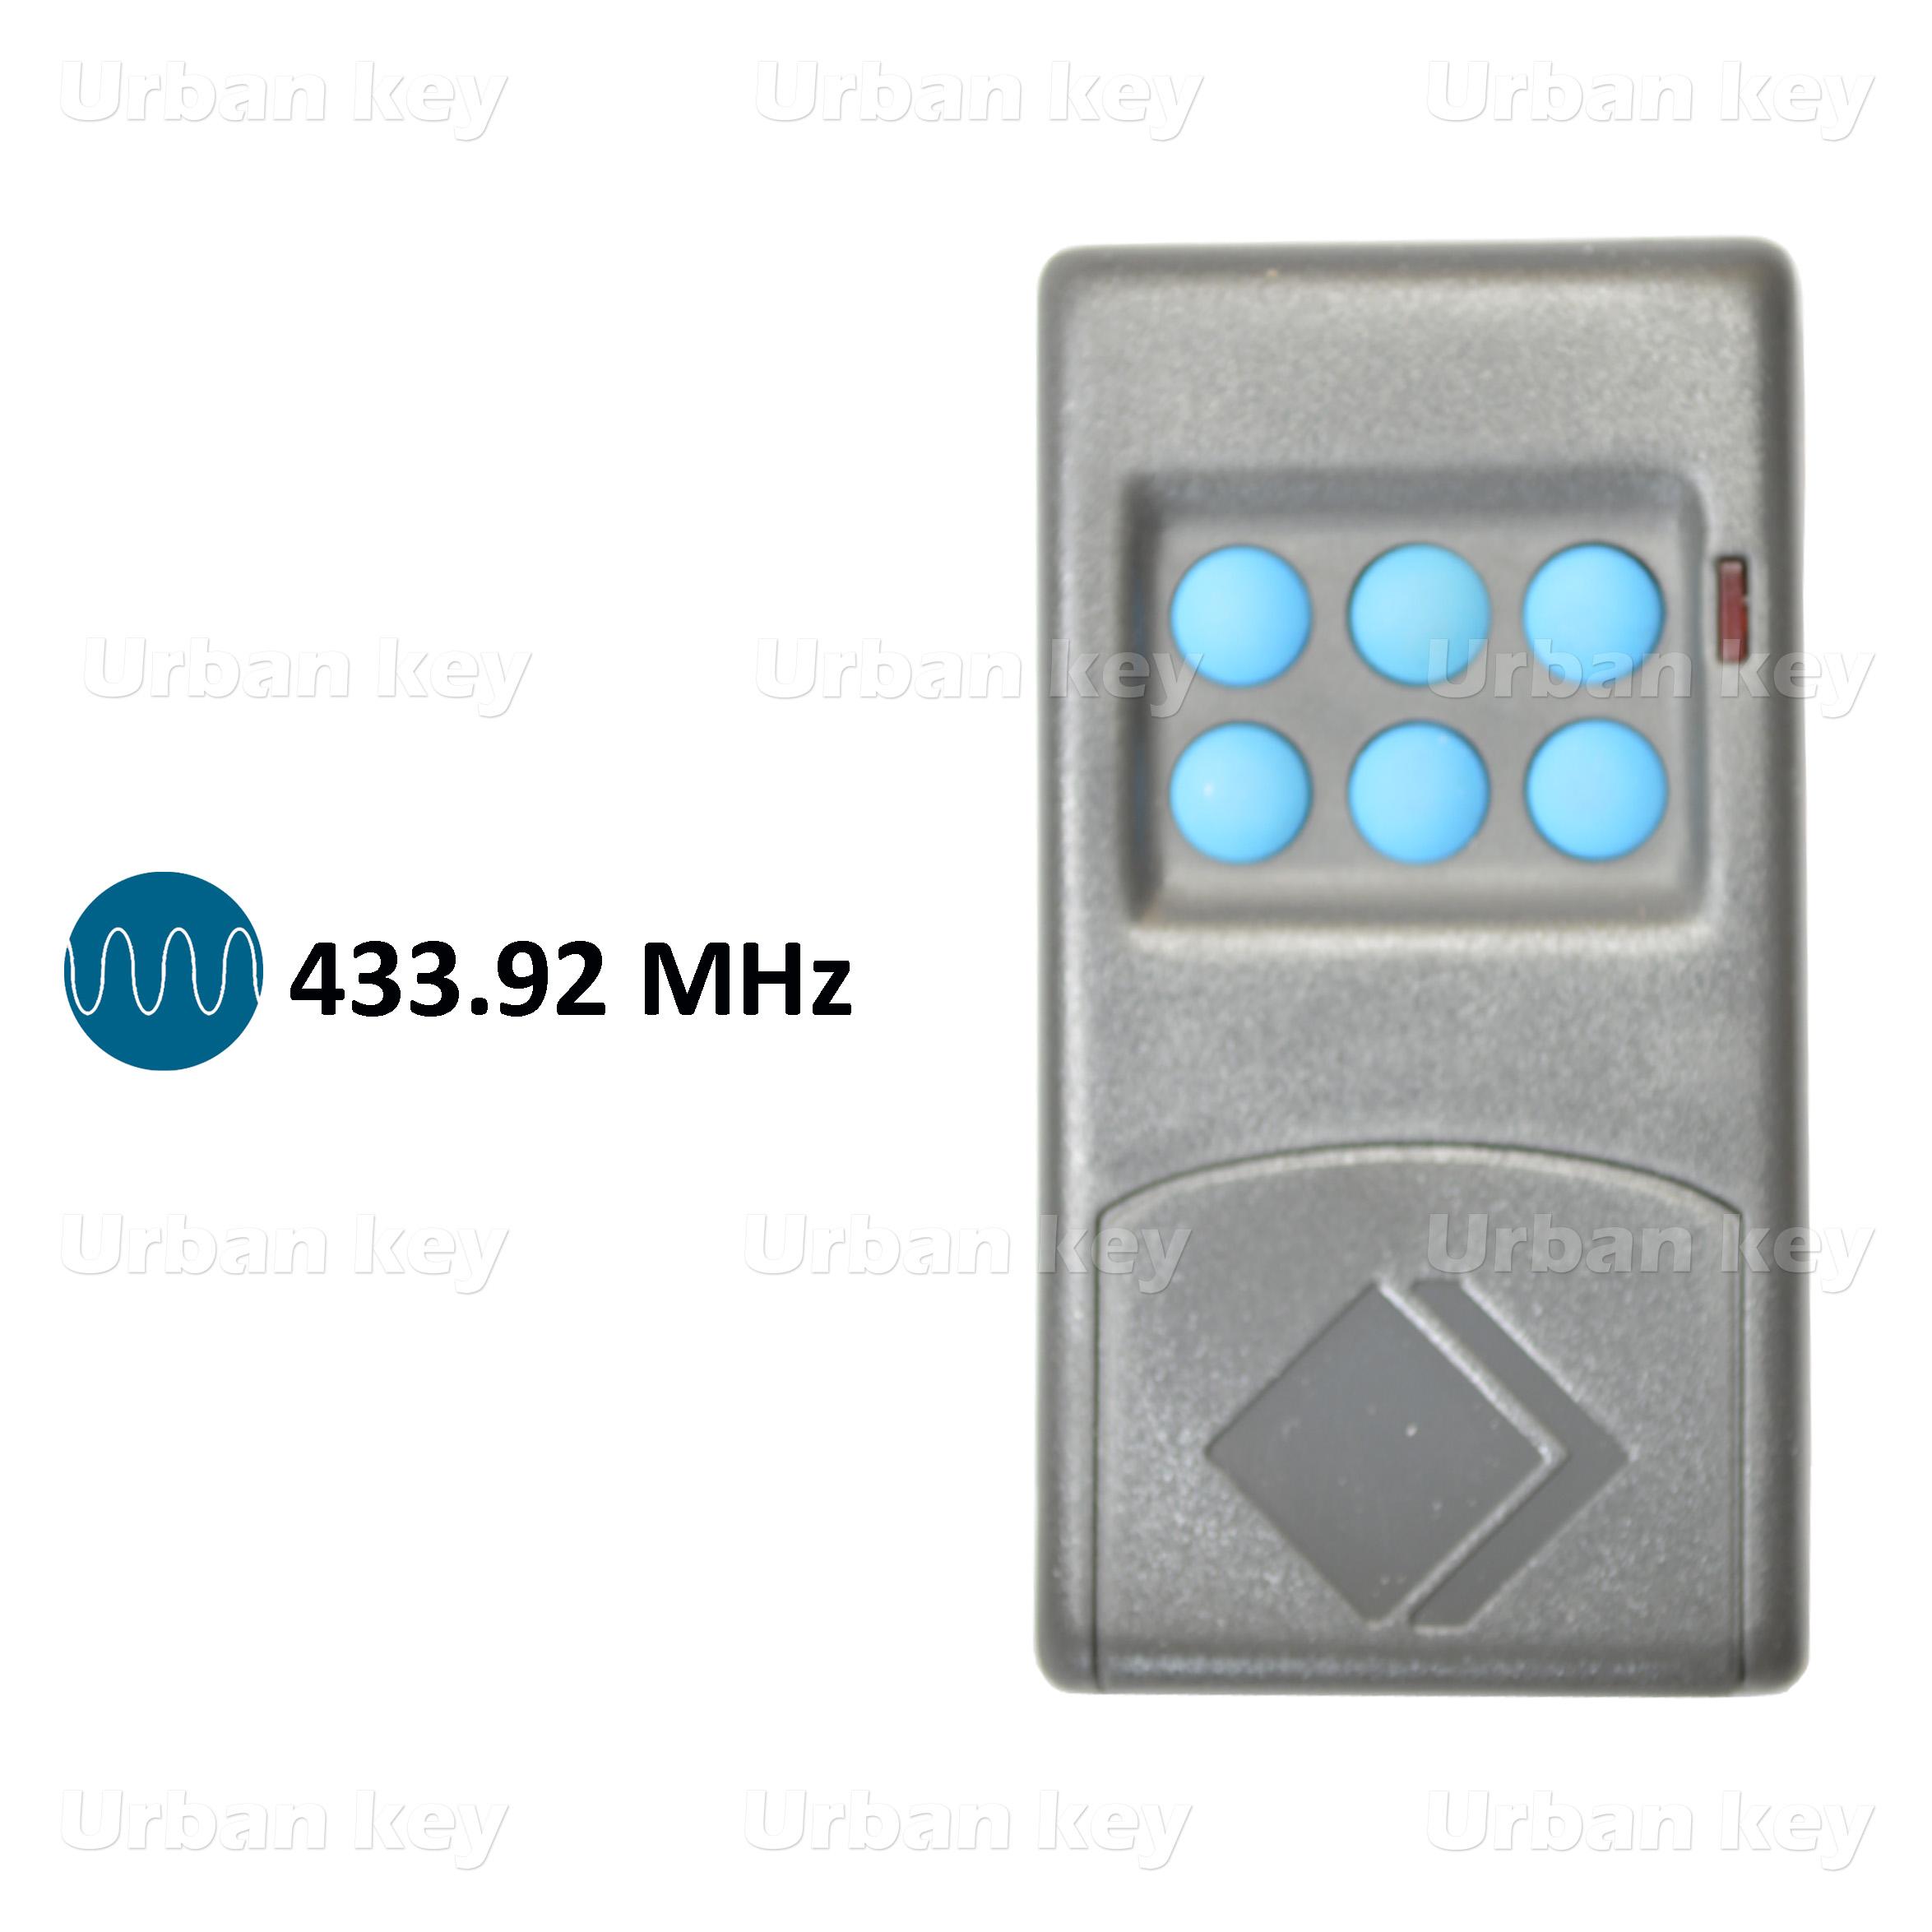 EMISSOR MOTORLINE MX6 433MHZ 6 CANAIS